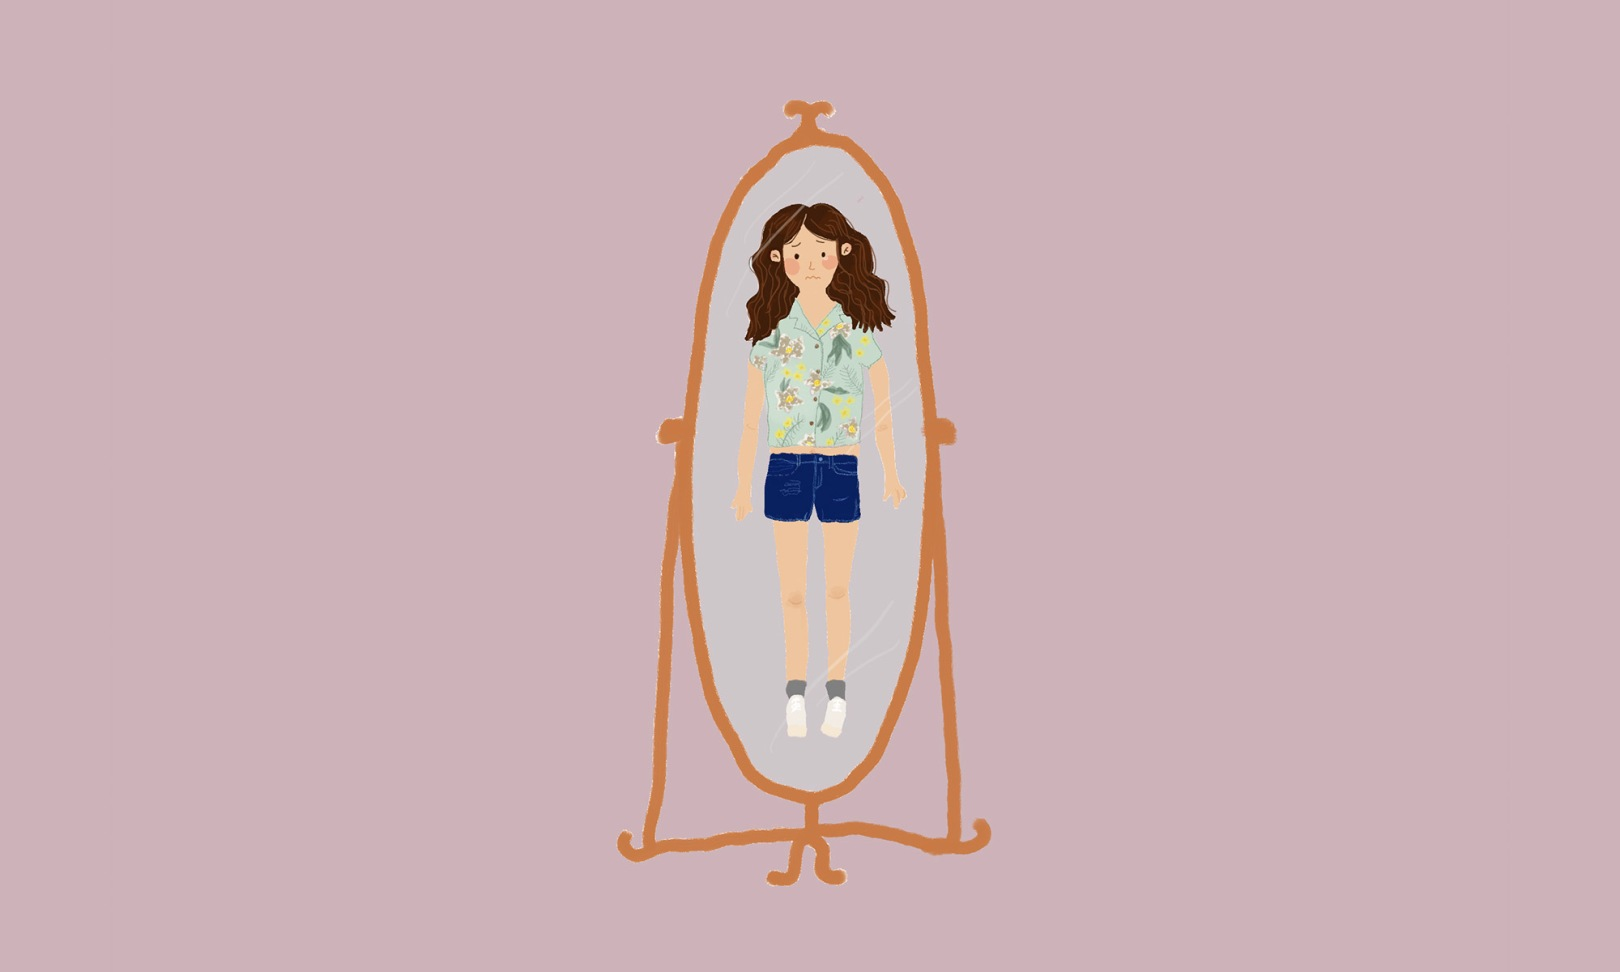 Body image, body neutrality, self-esteem and self-compassion - WILDCHILD SG